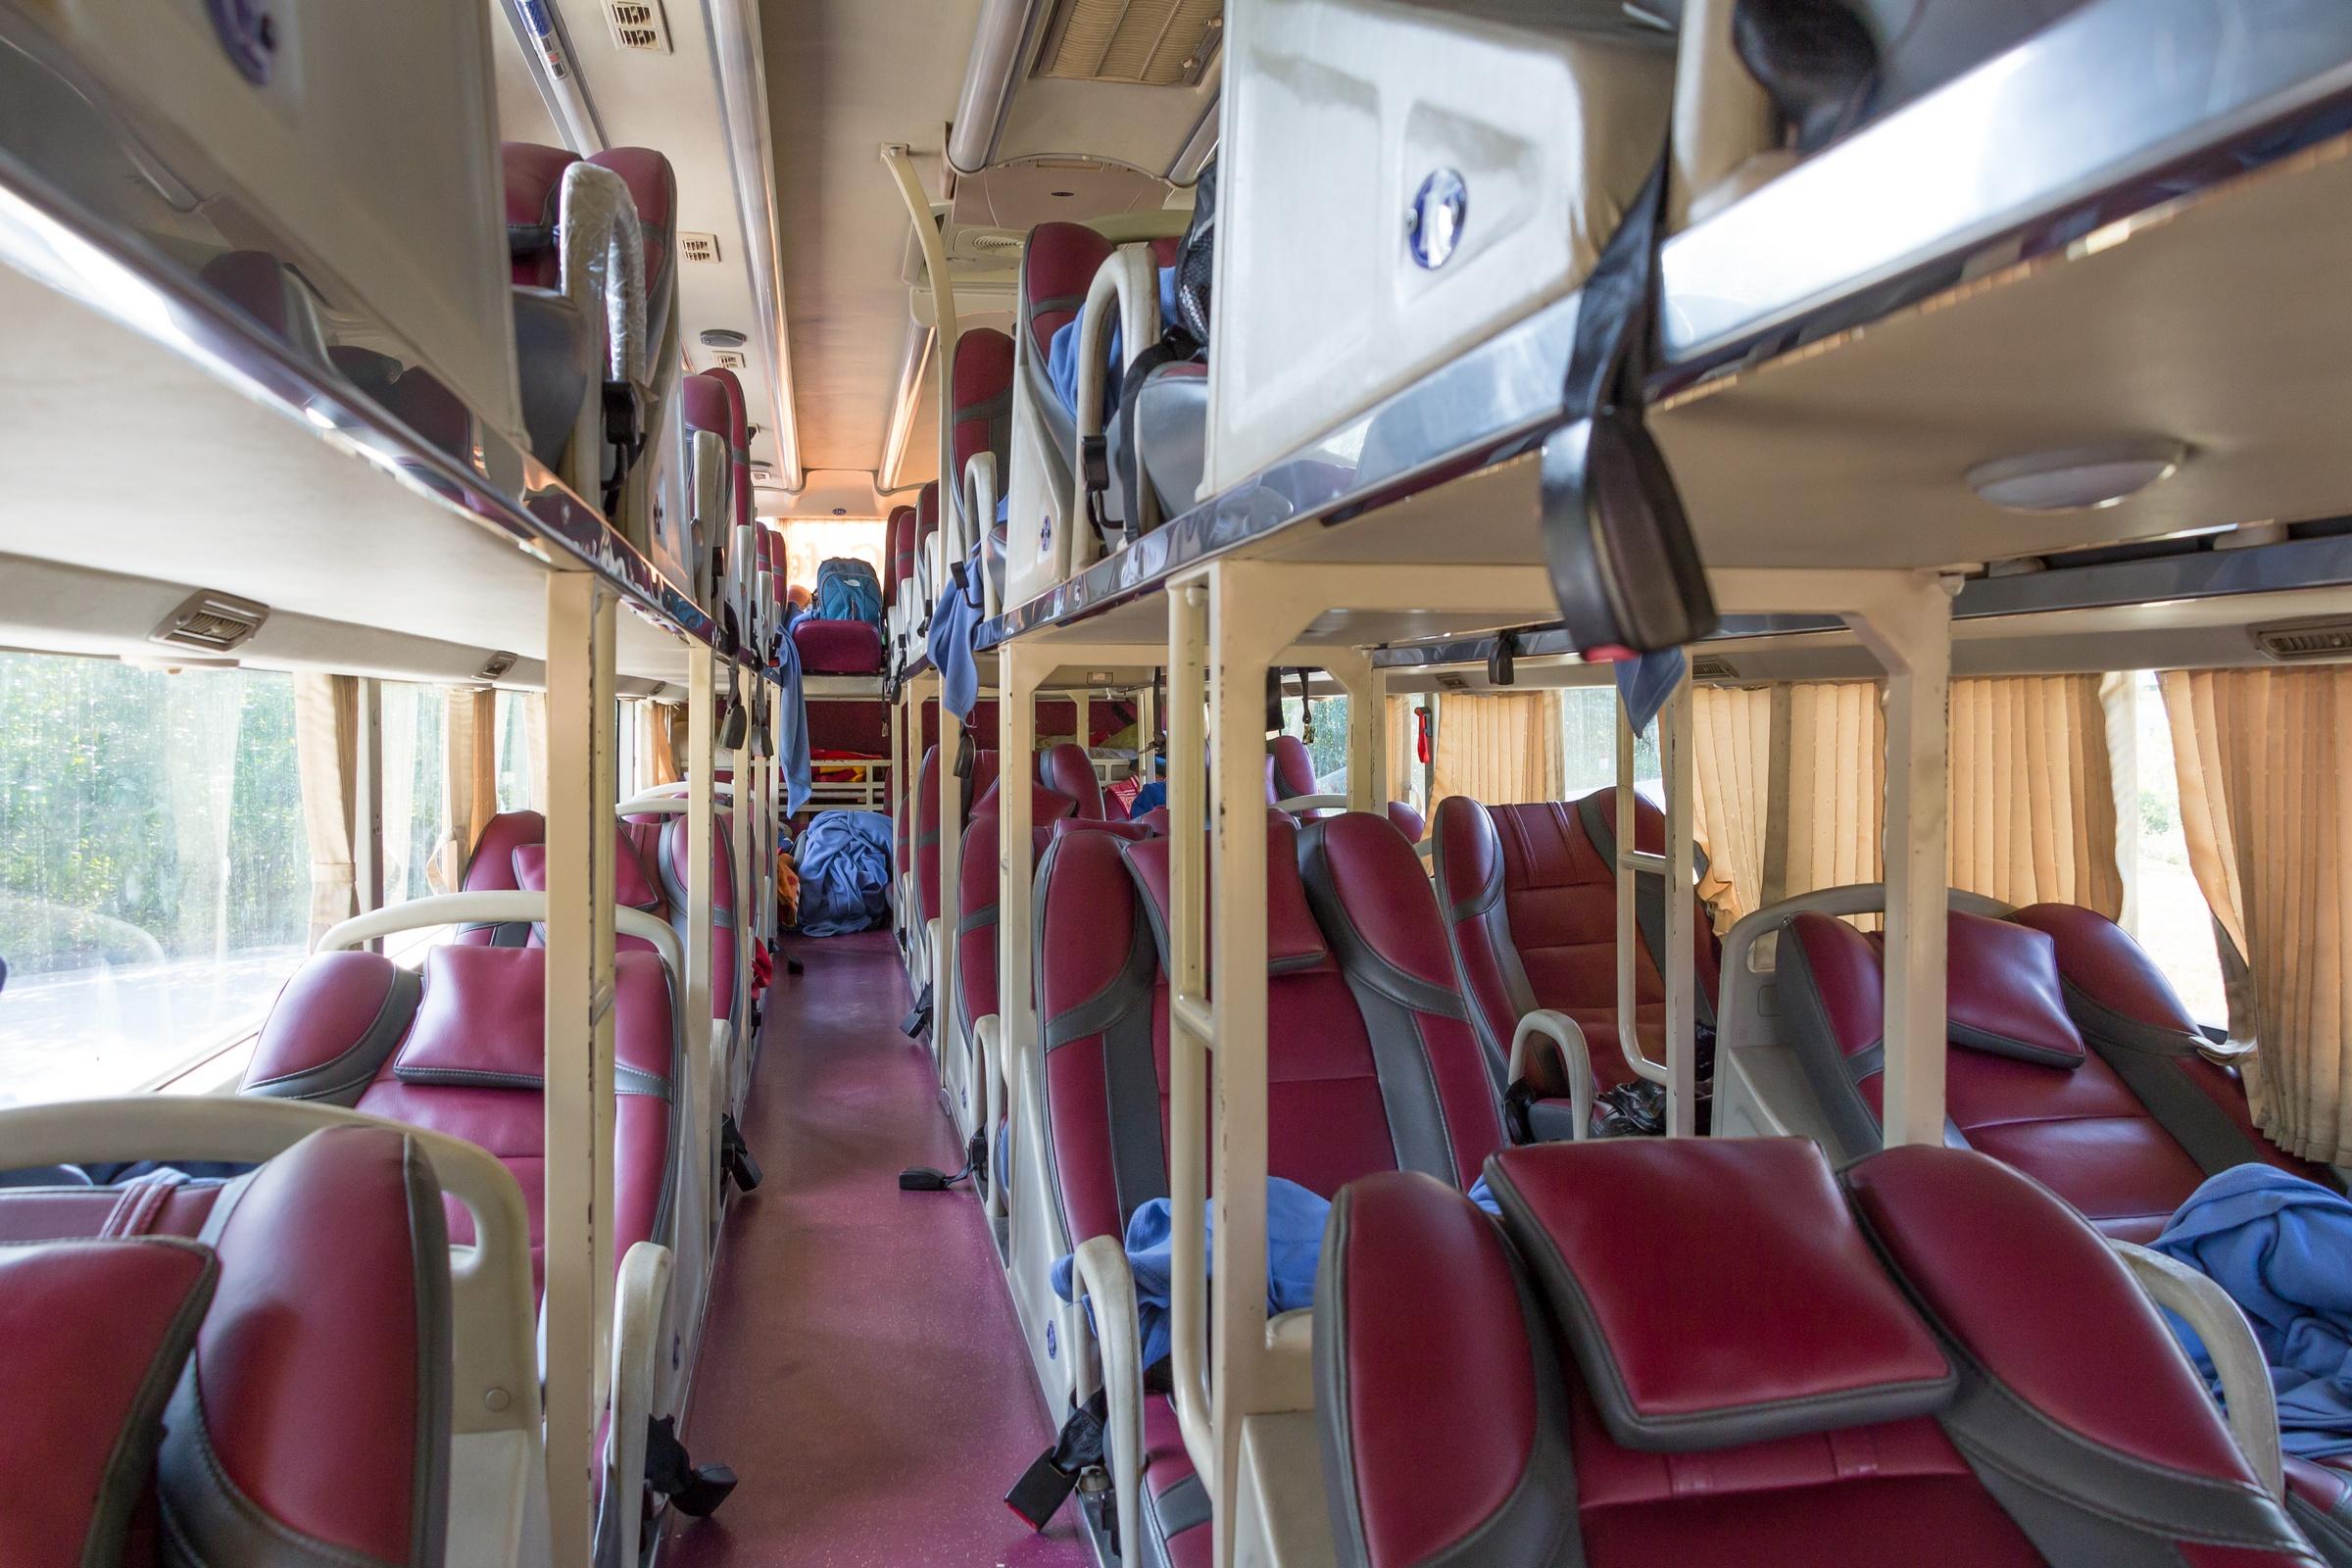 File:Thaco Mobihome sleeper bus interior.jpg - Wikimedia ...